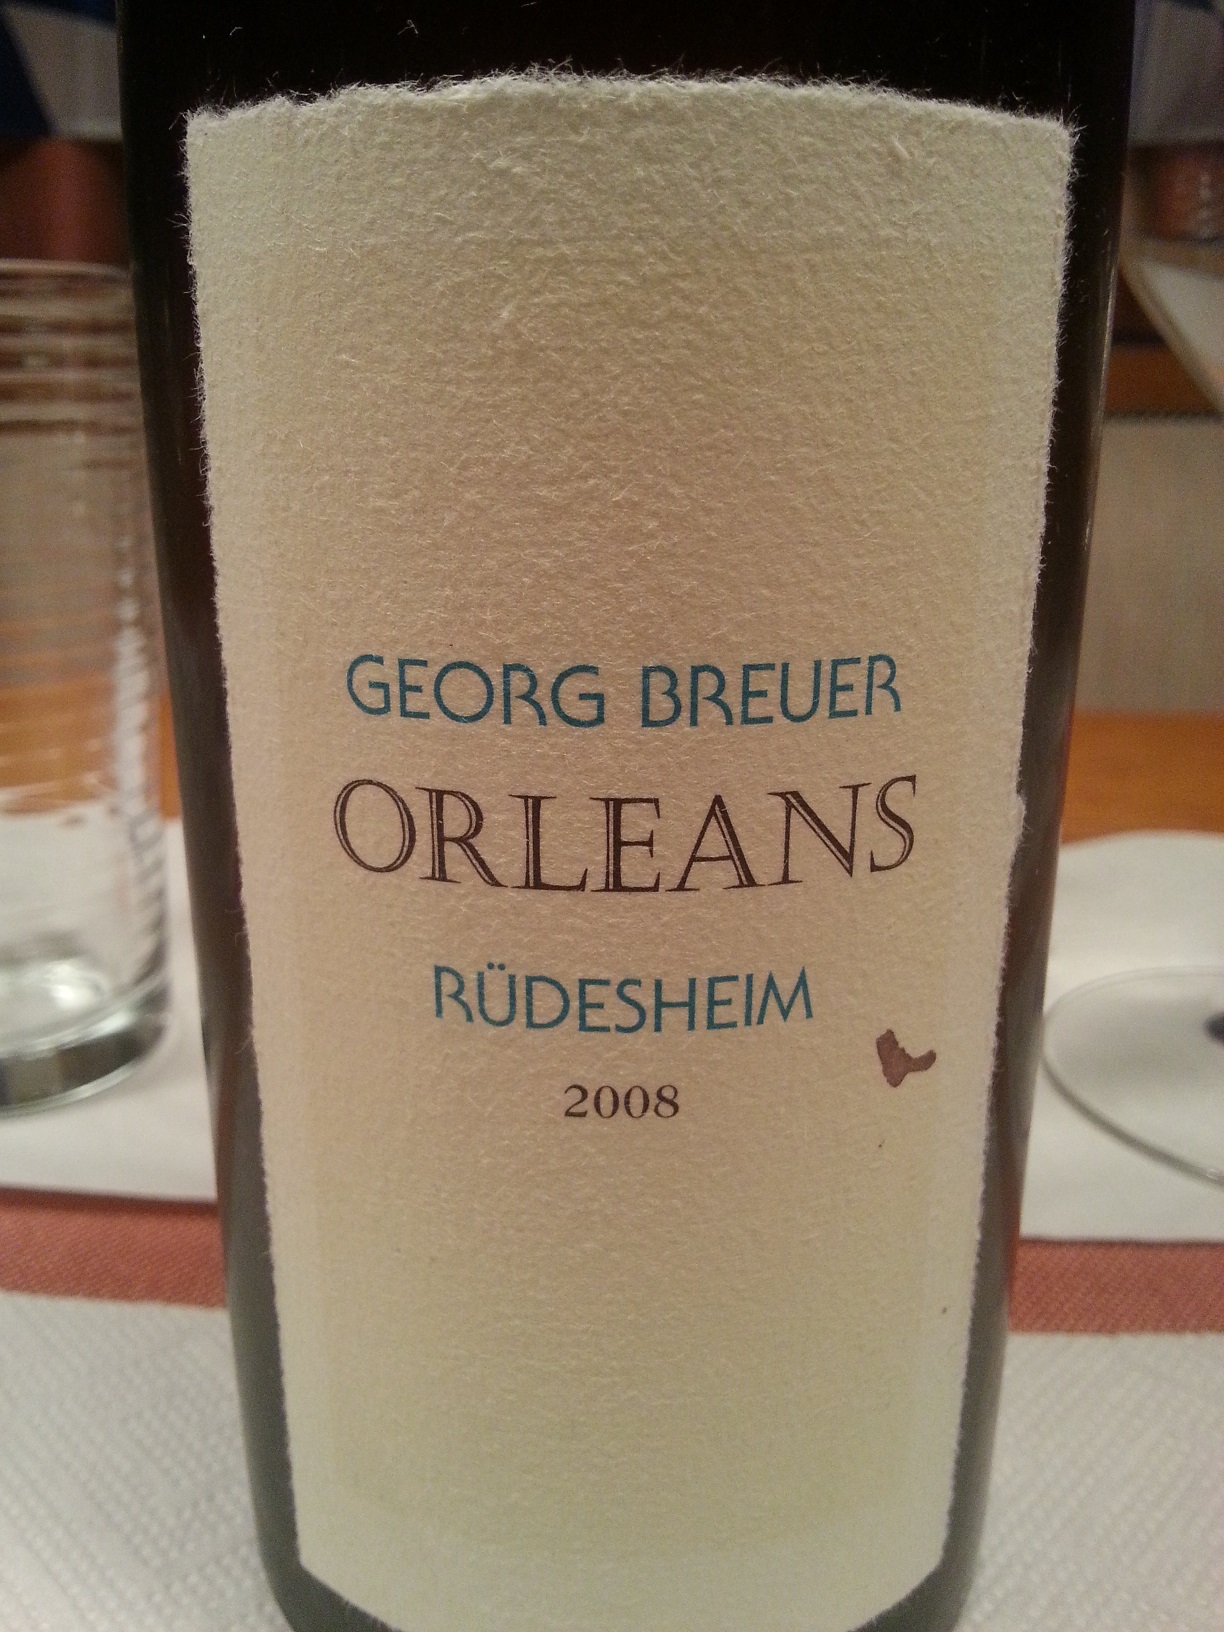 2008 Rüdesheimer Orleans | Breuer